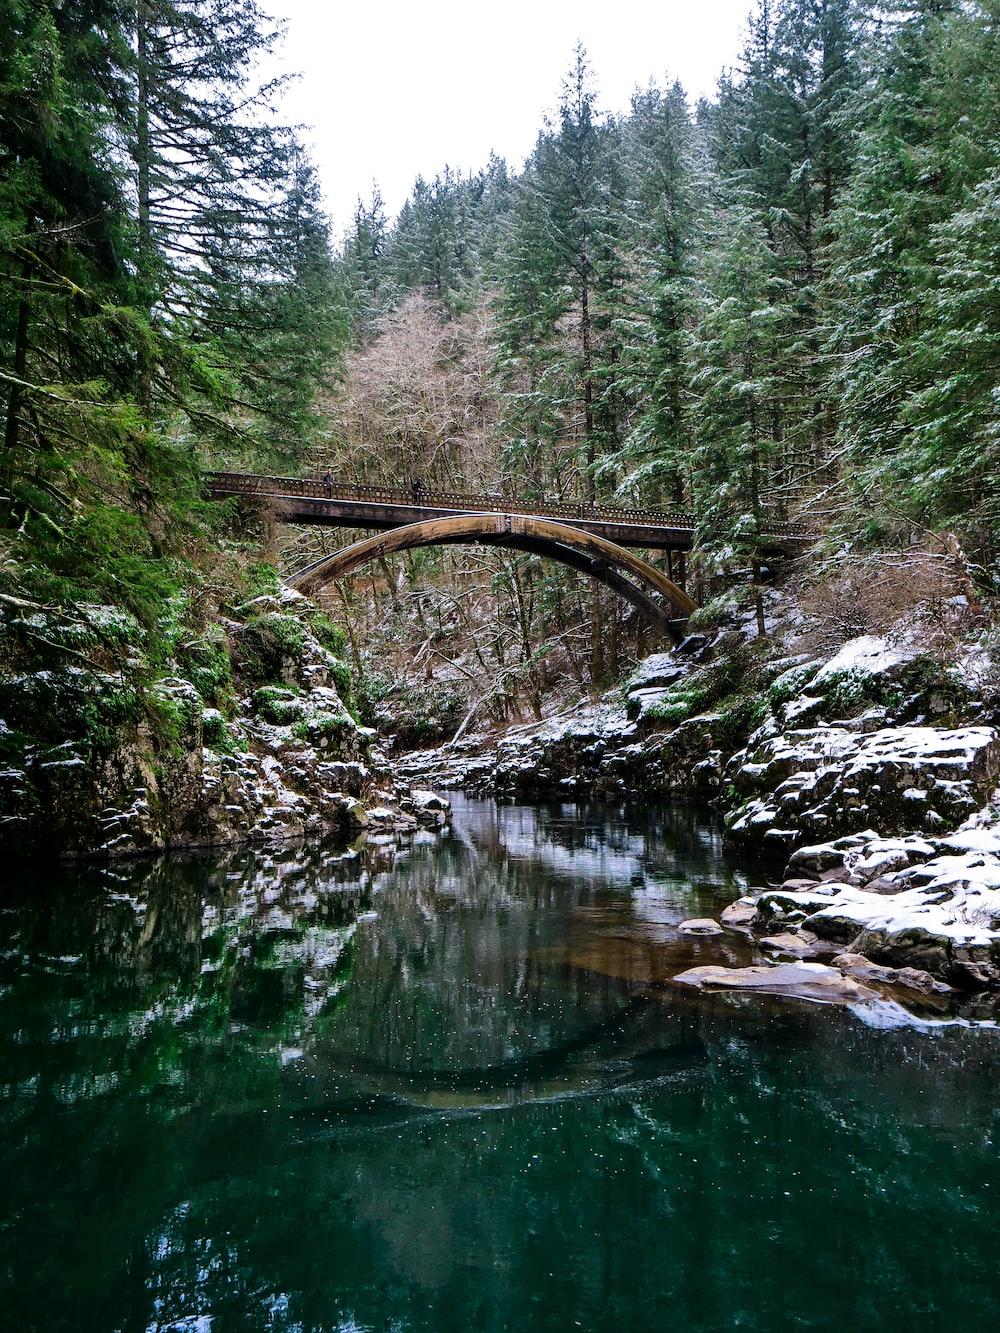 bridge between trees and lake at daytime